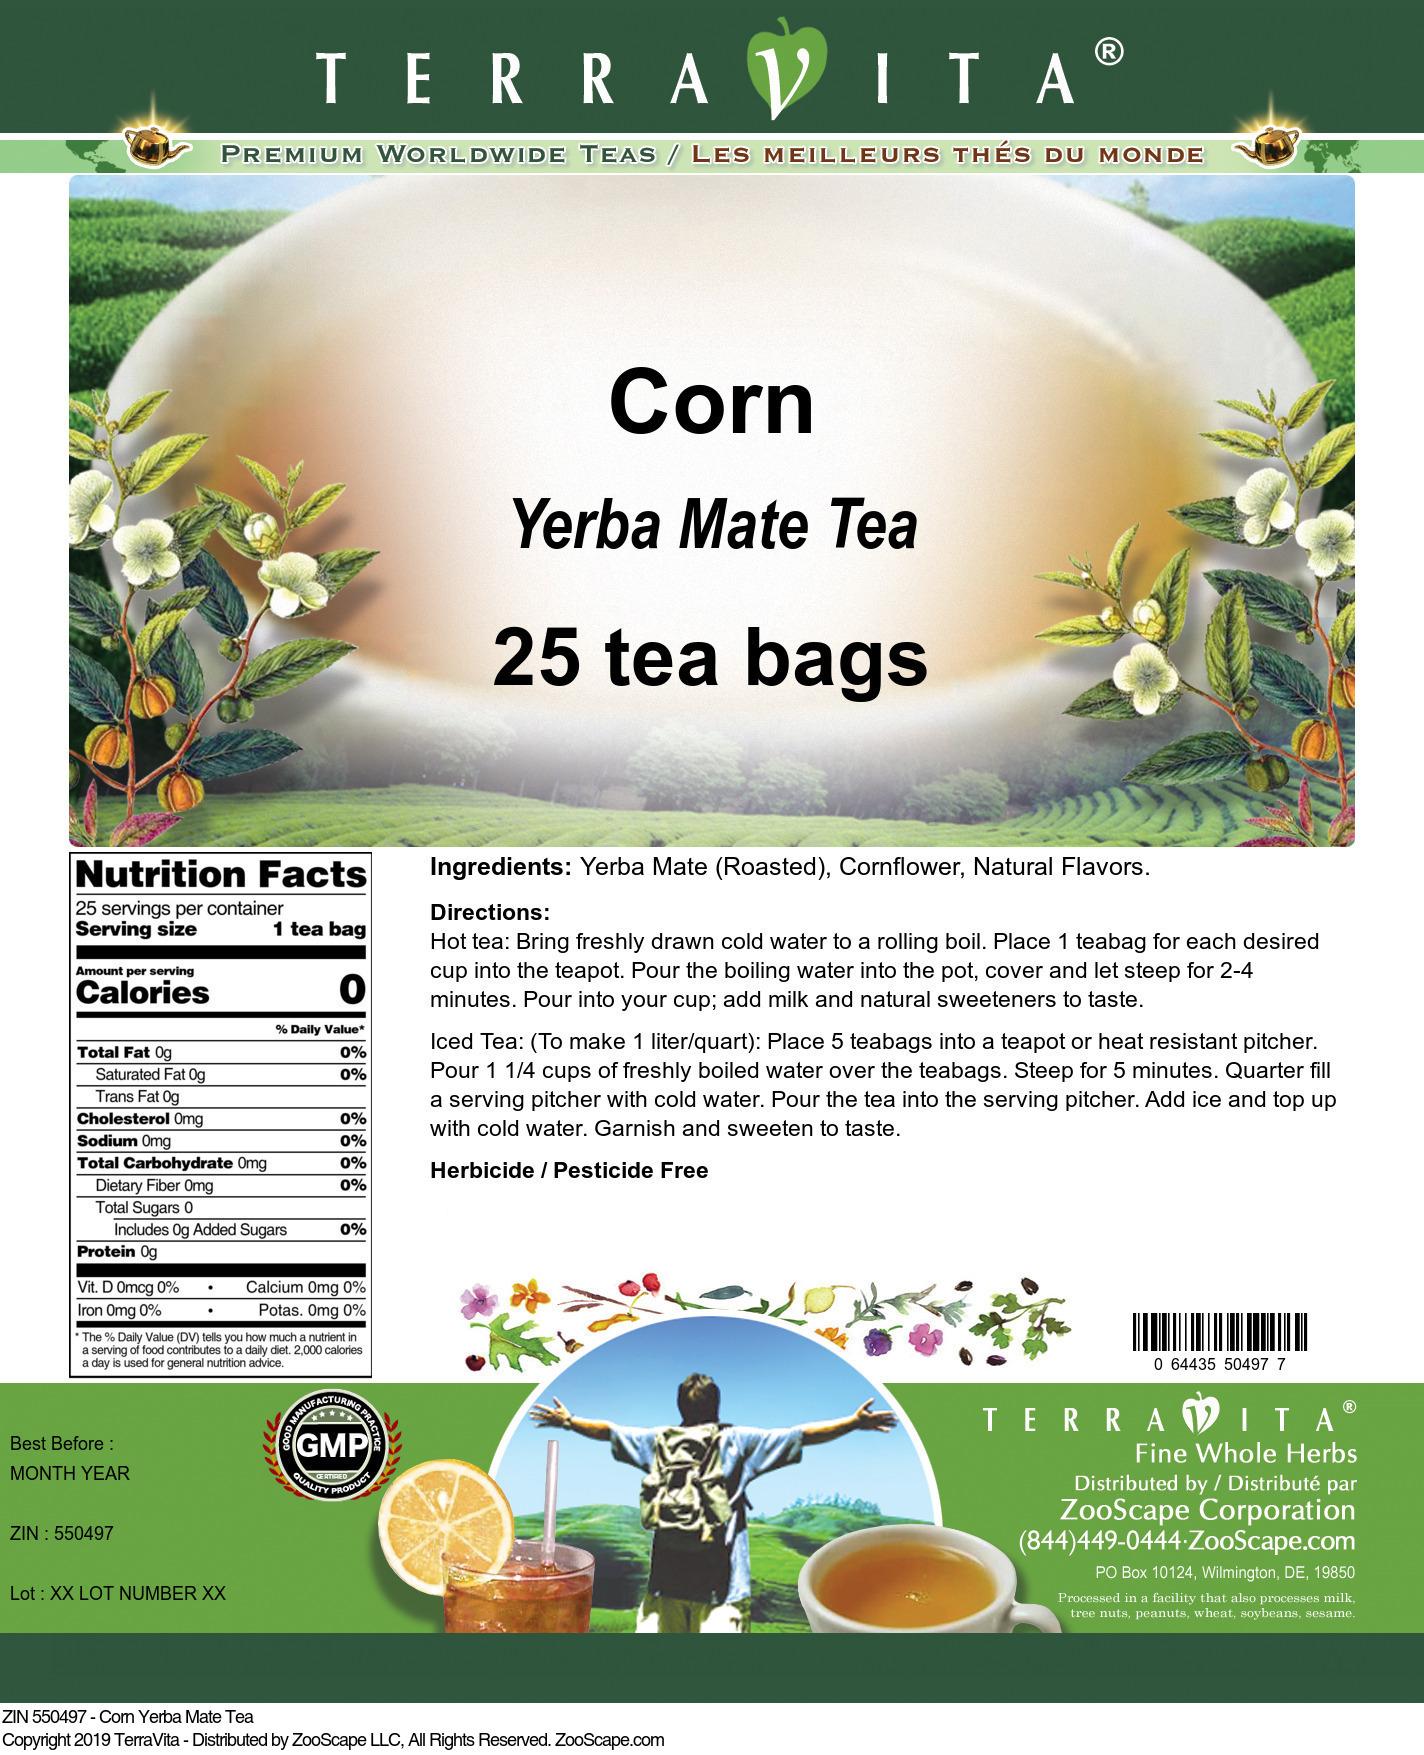 Corn Yerba Mate